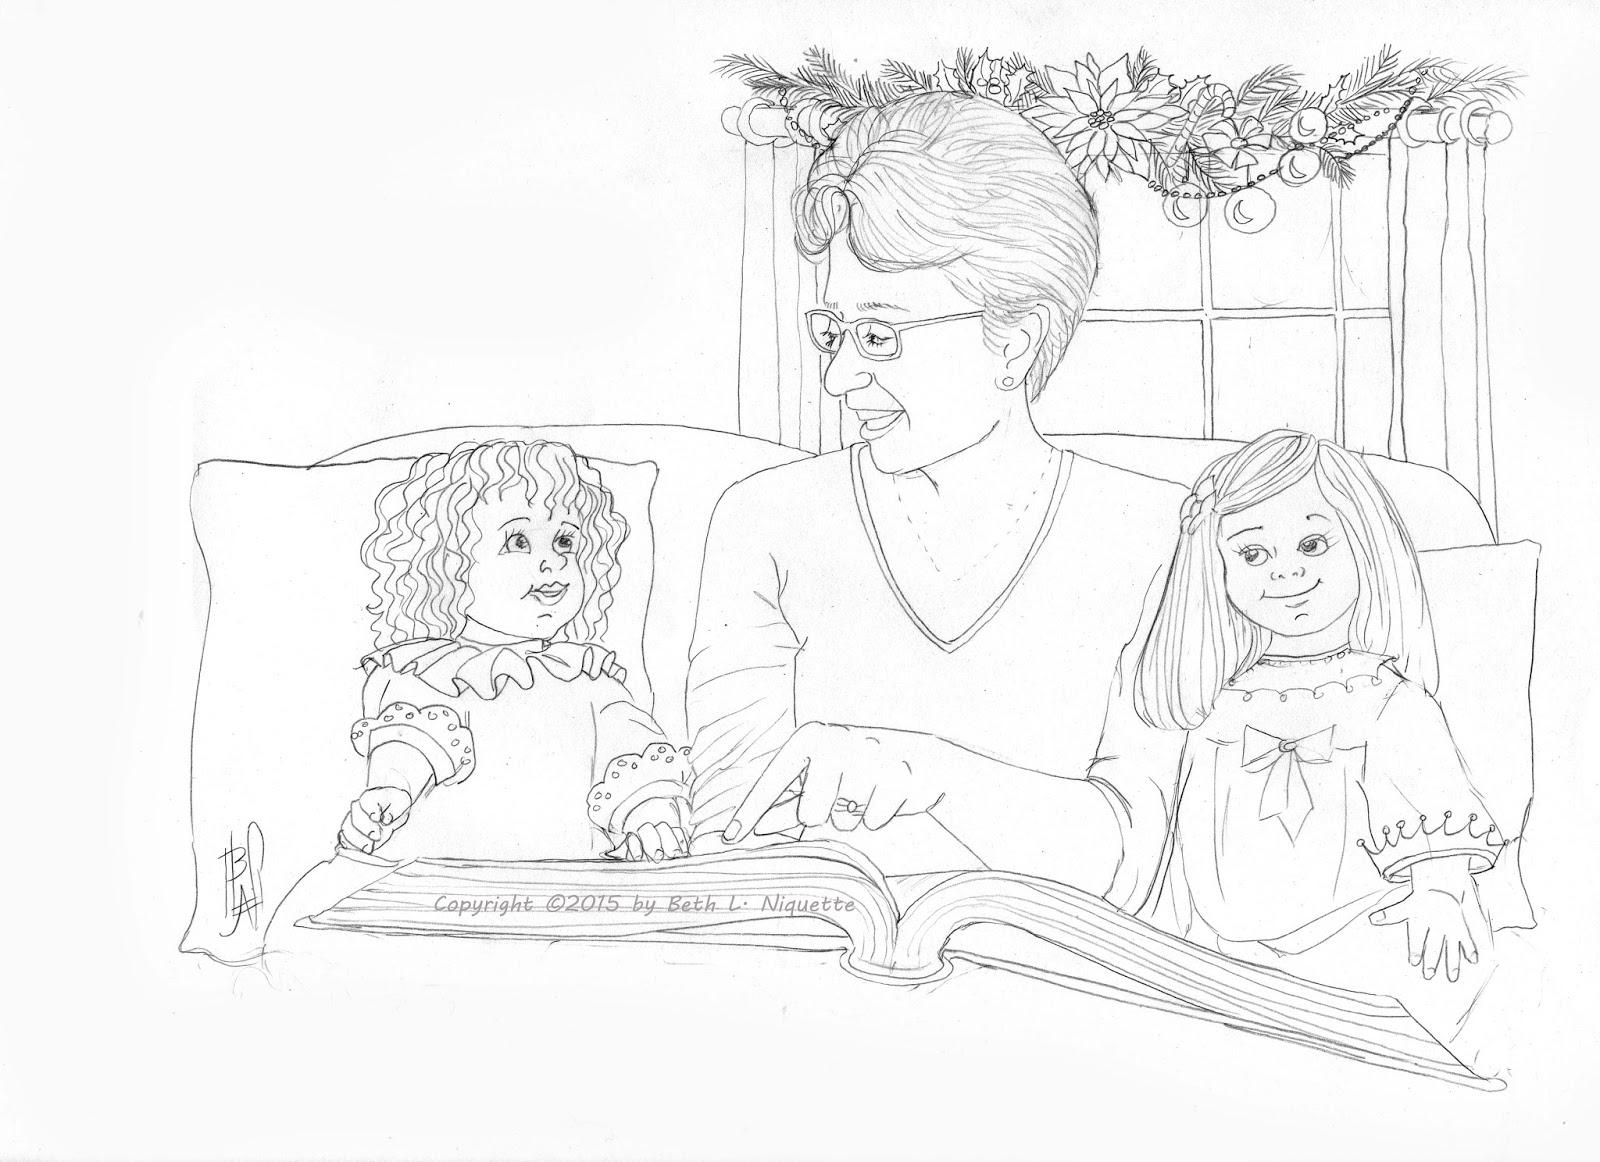 1600x1162 Beth's Artworx Grandma's Christmas Story Paint Party Friday